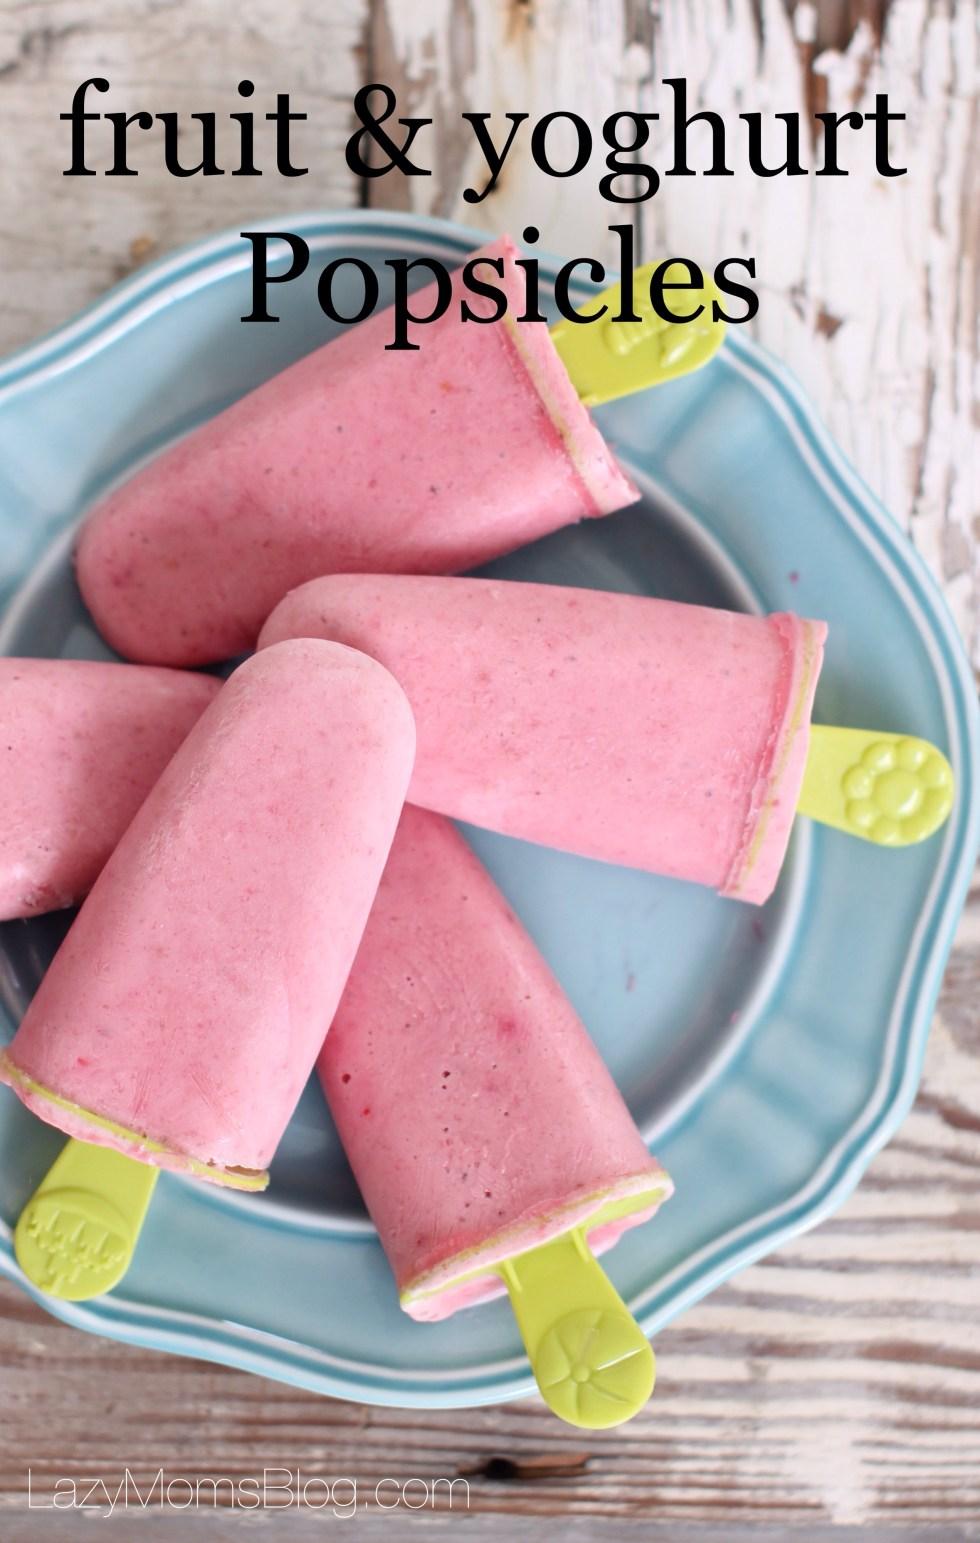 Fruit & yoghurt healthy Popsicles